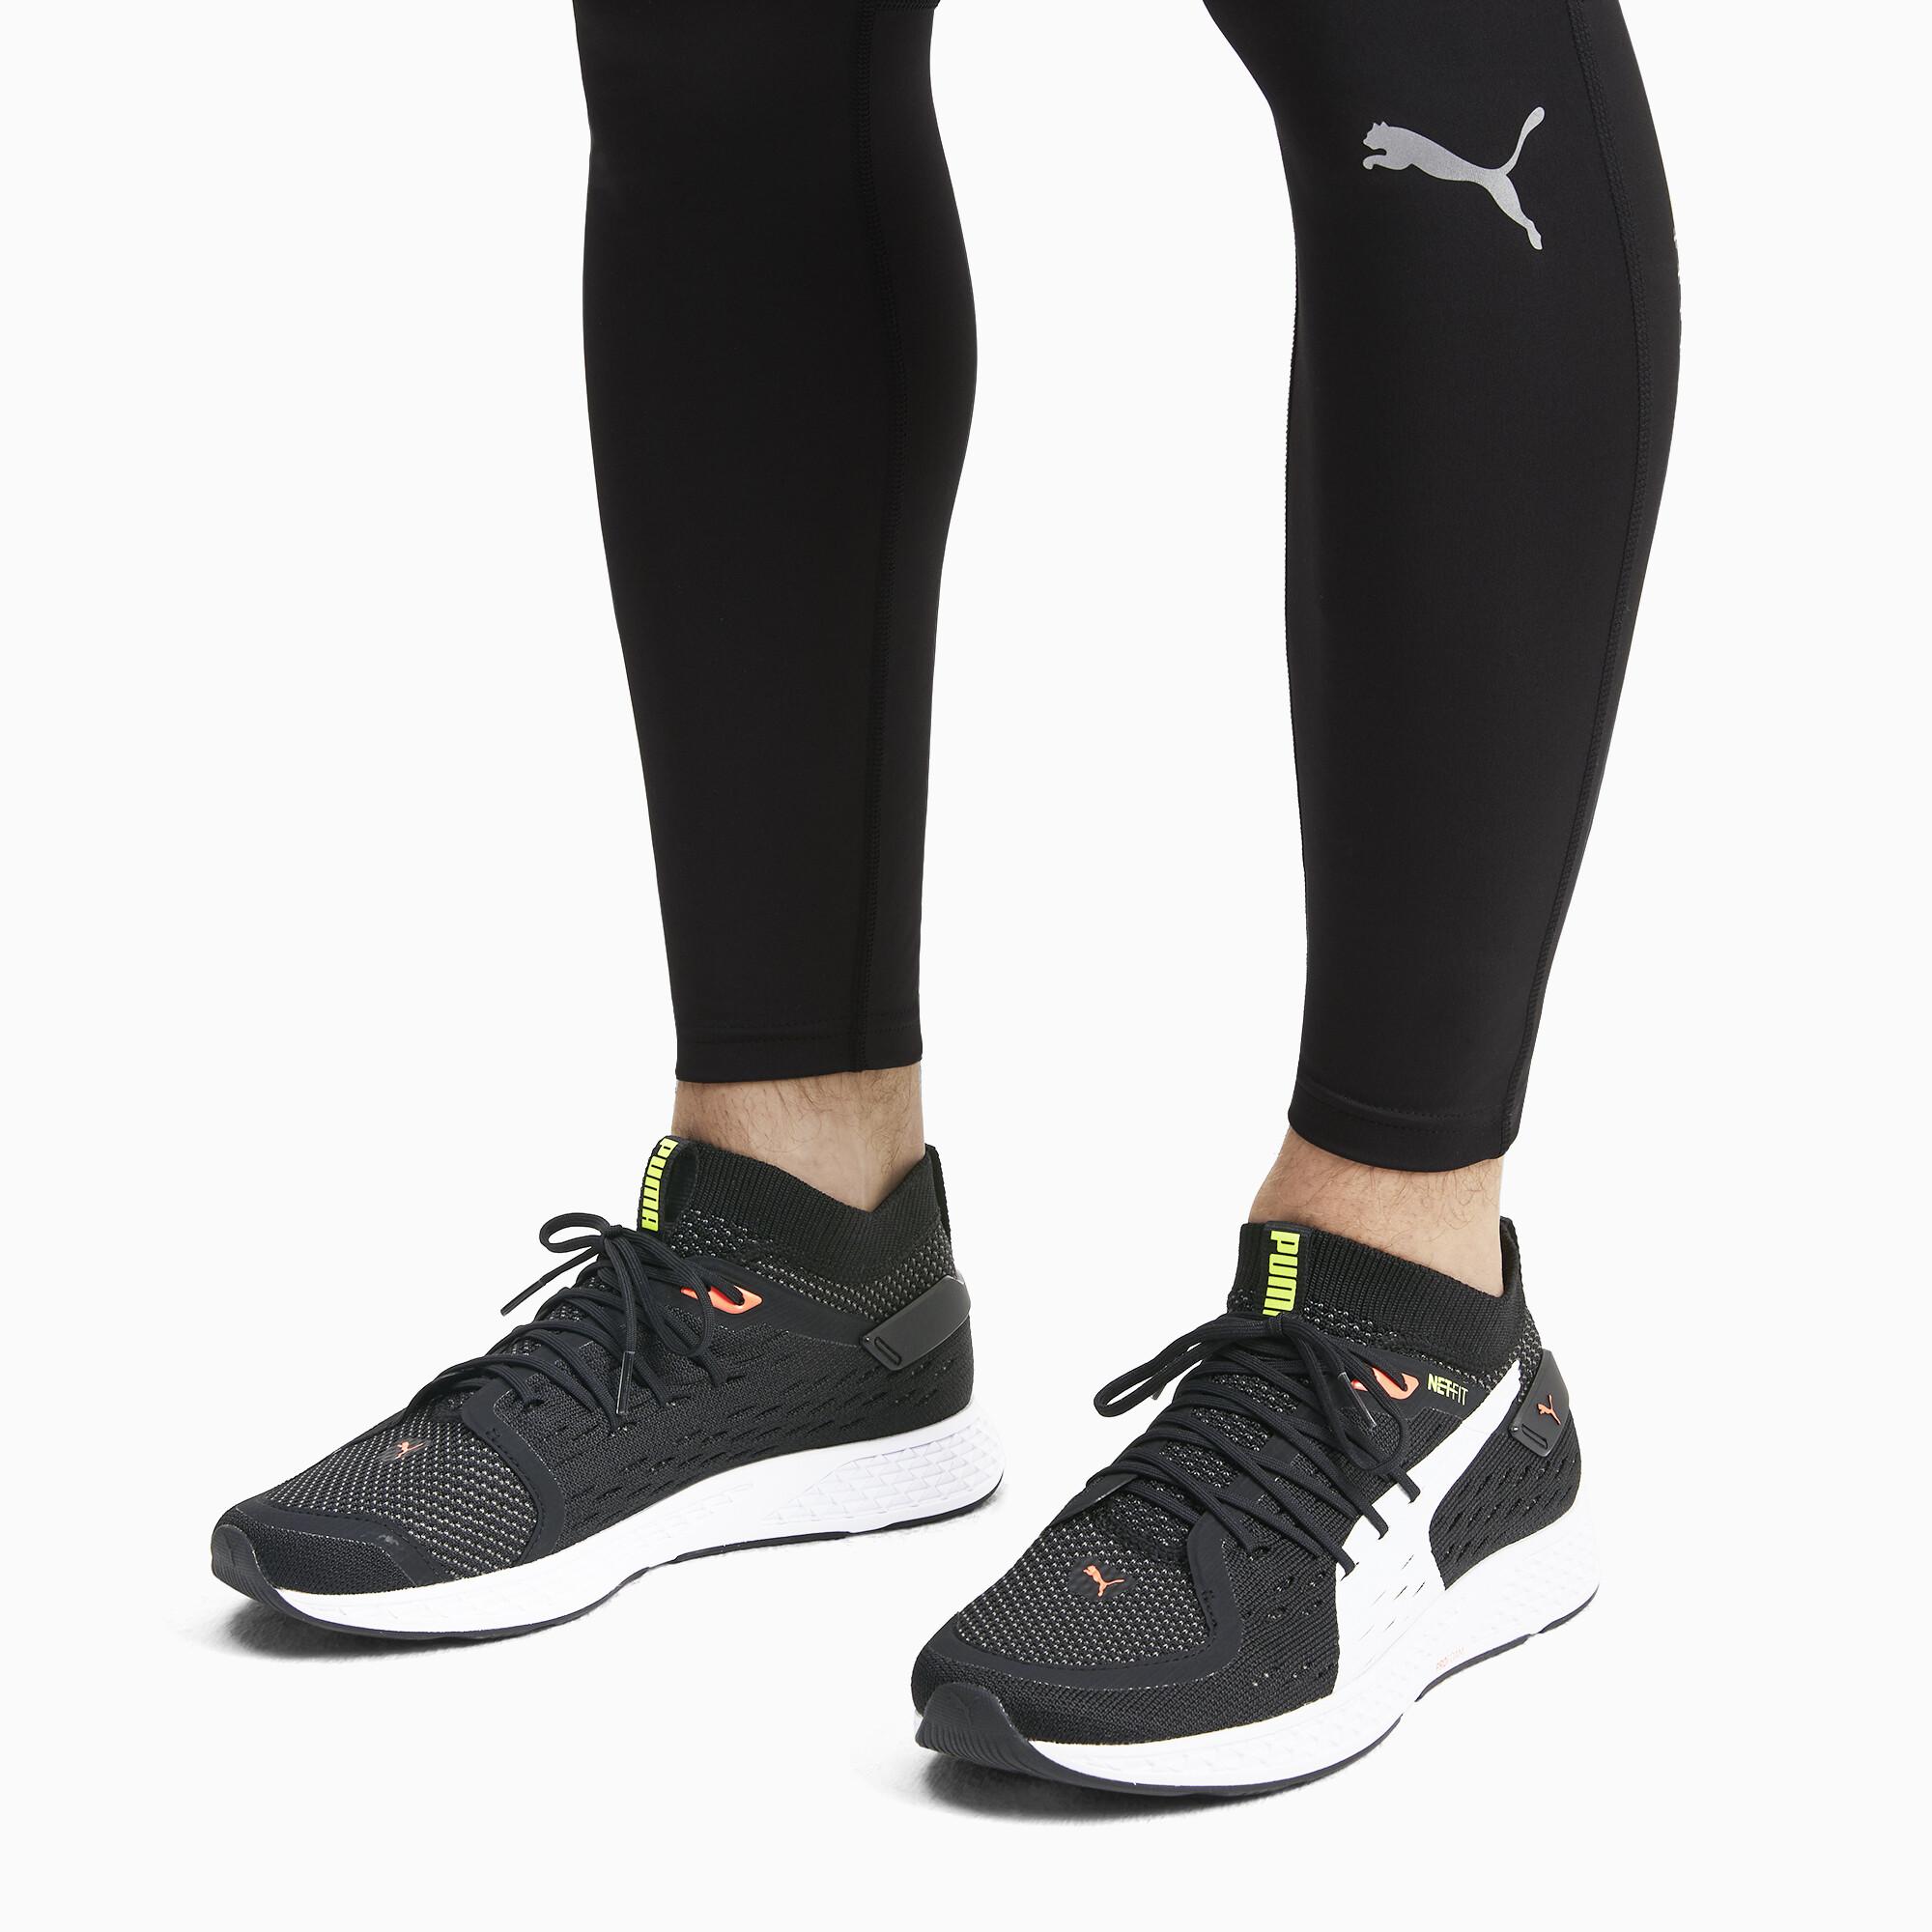 PUMA-SPEED-500-Men-039-s-Running-Shoes-Men-Shoe-Running thumbnail 5